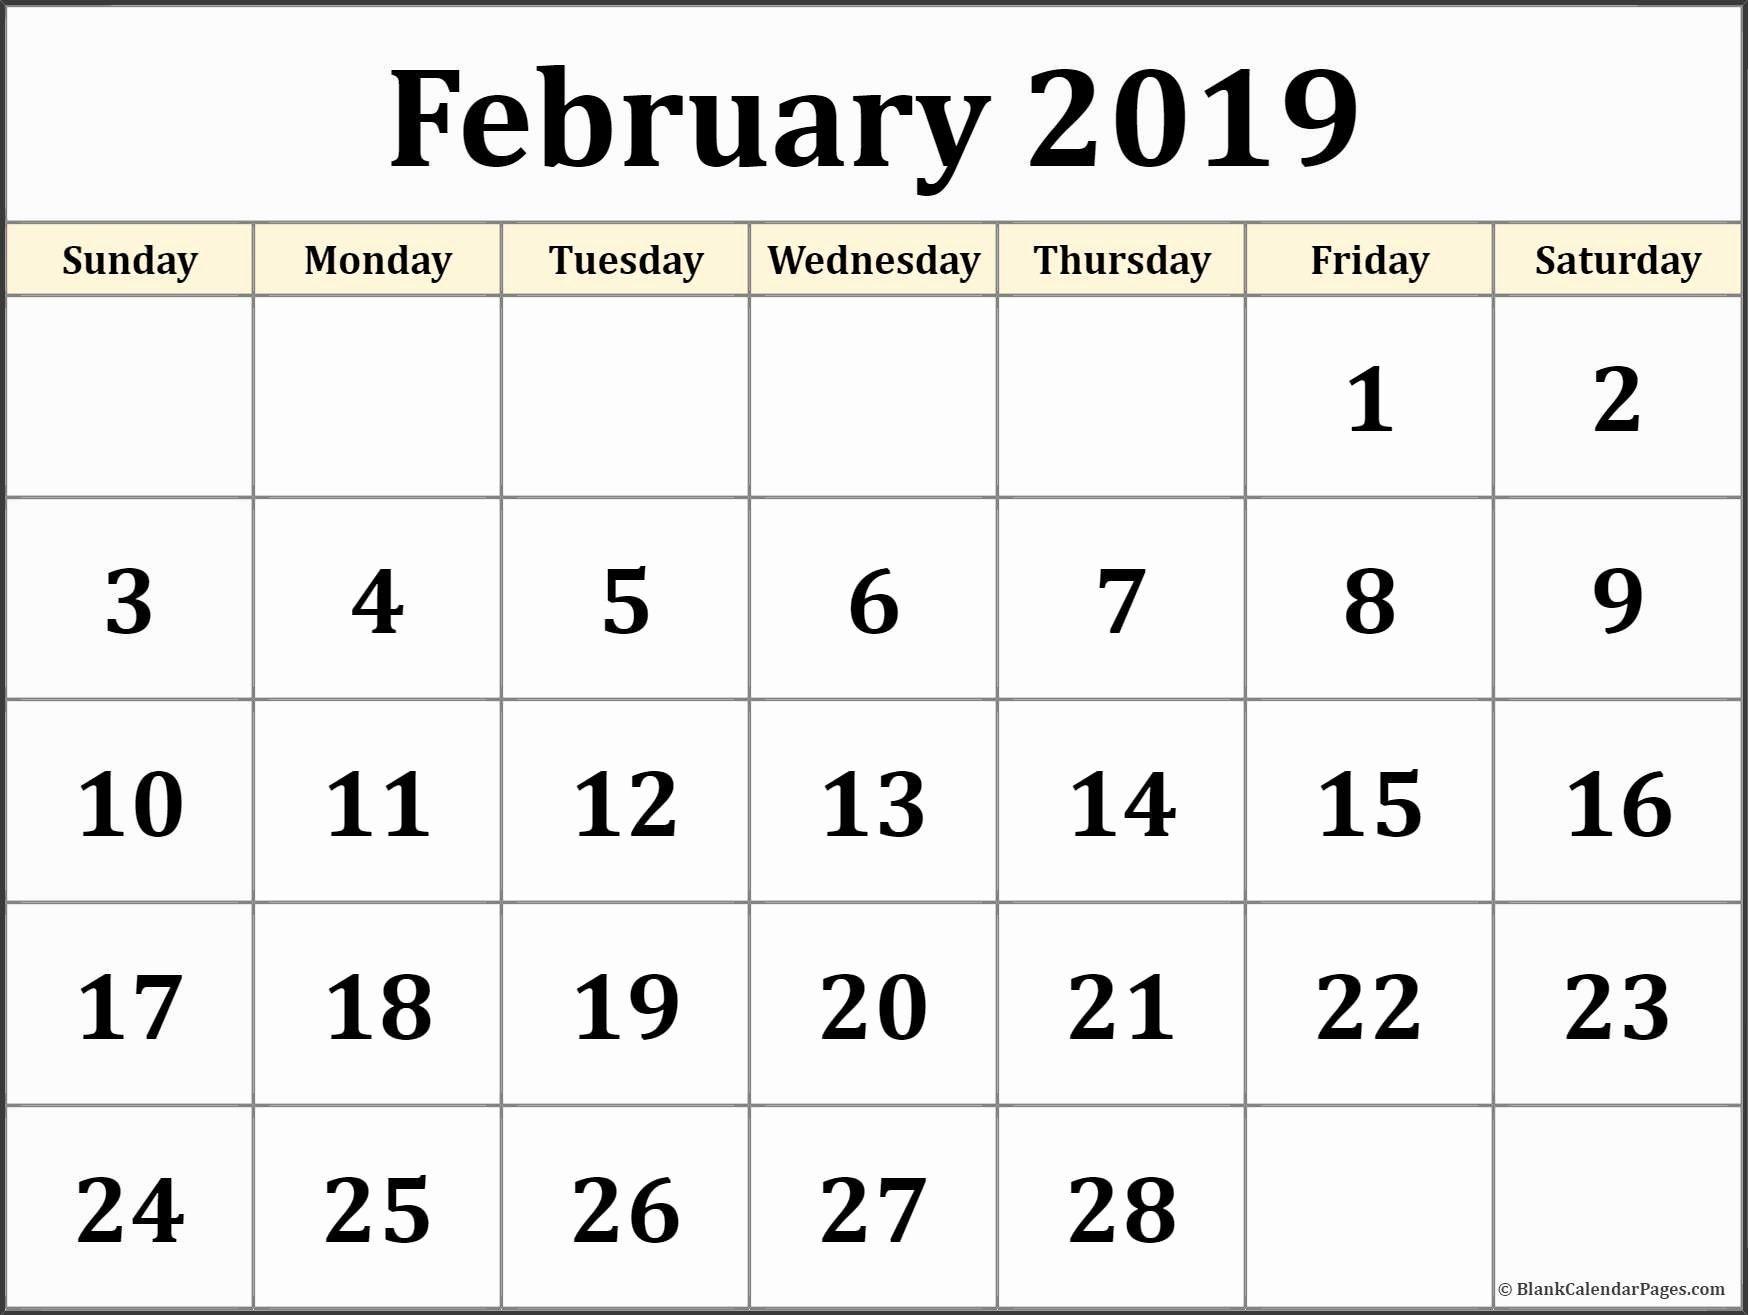 March Calendar Canada Más Arriba-a-fecha February 2019 Blank Calendar Of March Calendar Canada Más Arriba-a-fecha Kalender Ausdrucken 2015 Schön Printable 0d Calendars Kalender